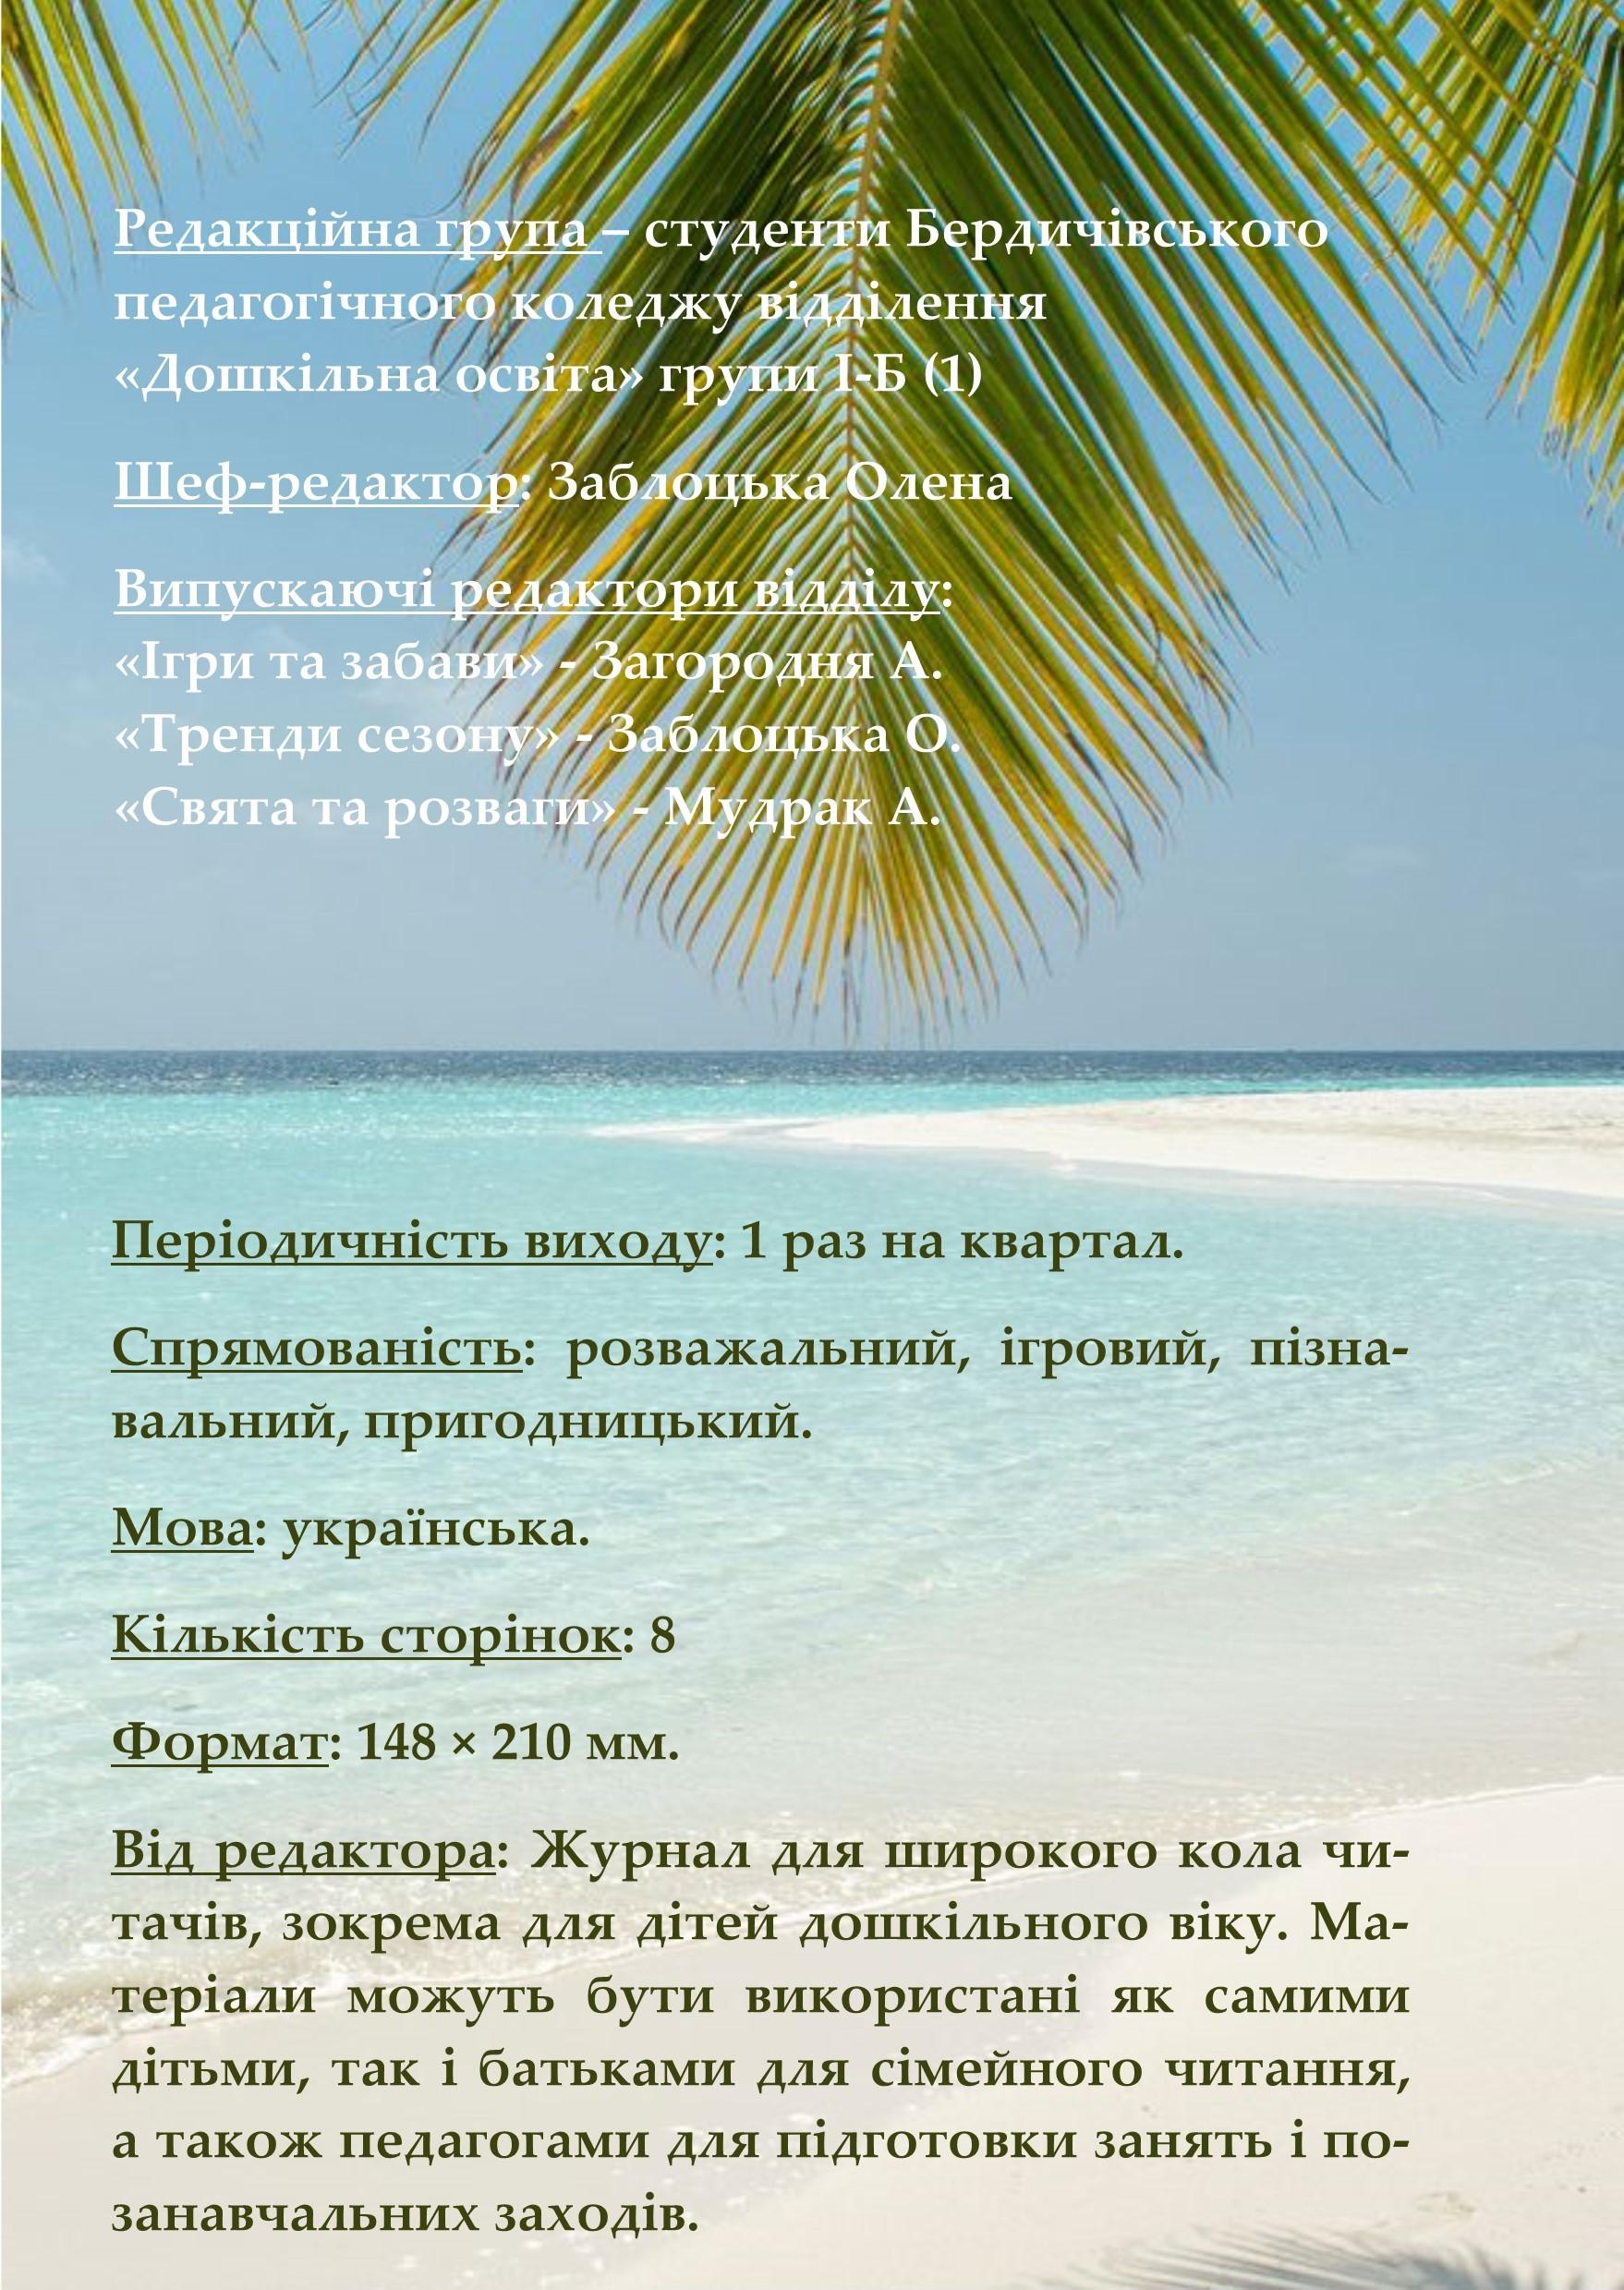 Грайландія – літо 2020 by Darina - Illustrated by .Студенти групи І-Б (1) 2019-2020 н.р - Ourboox.com